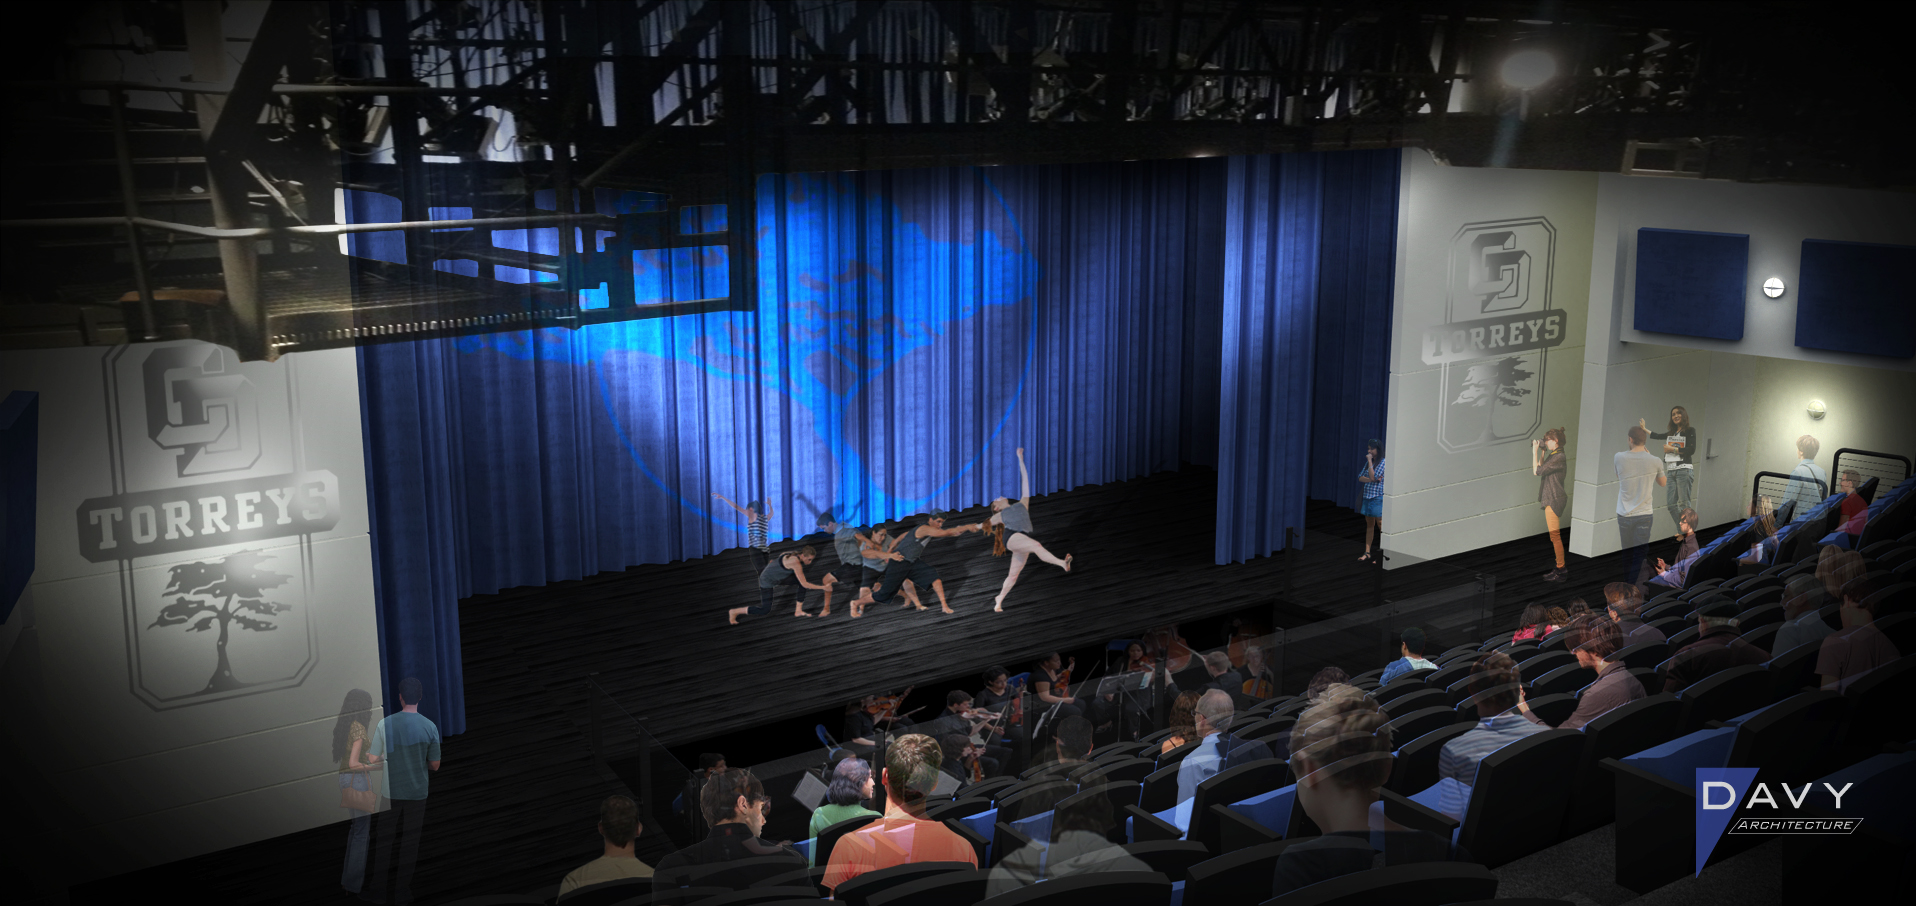 LJCDS PAC Theater Renovation_2013-11-11.jpg